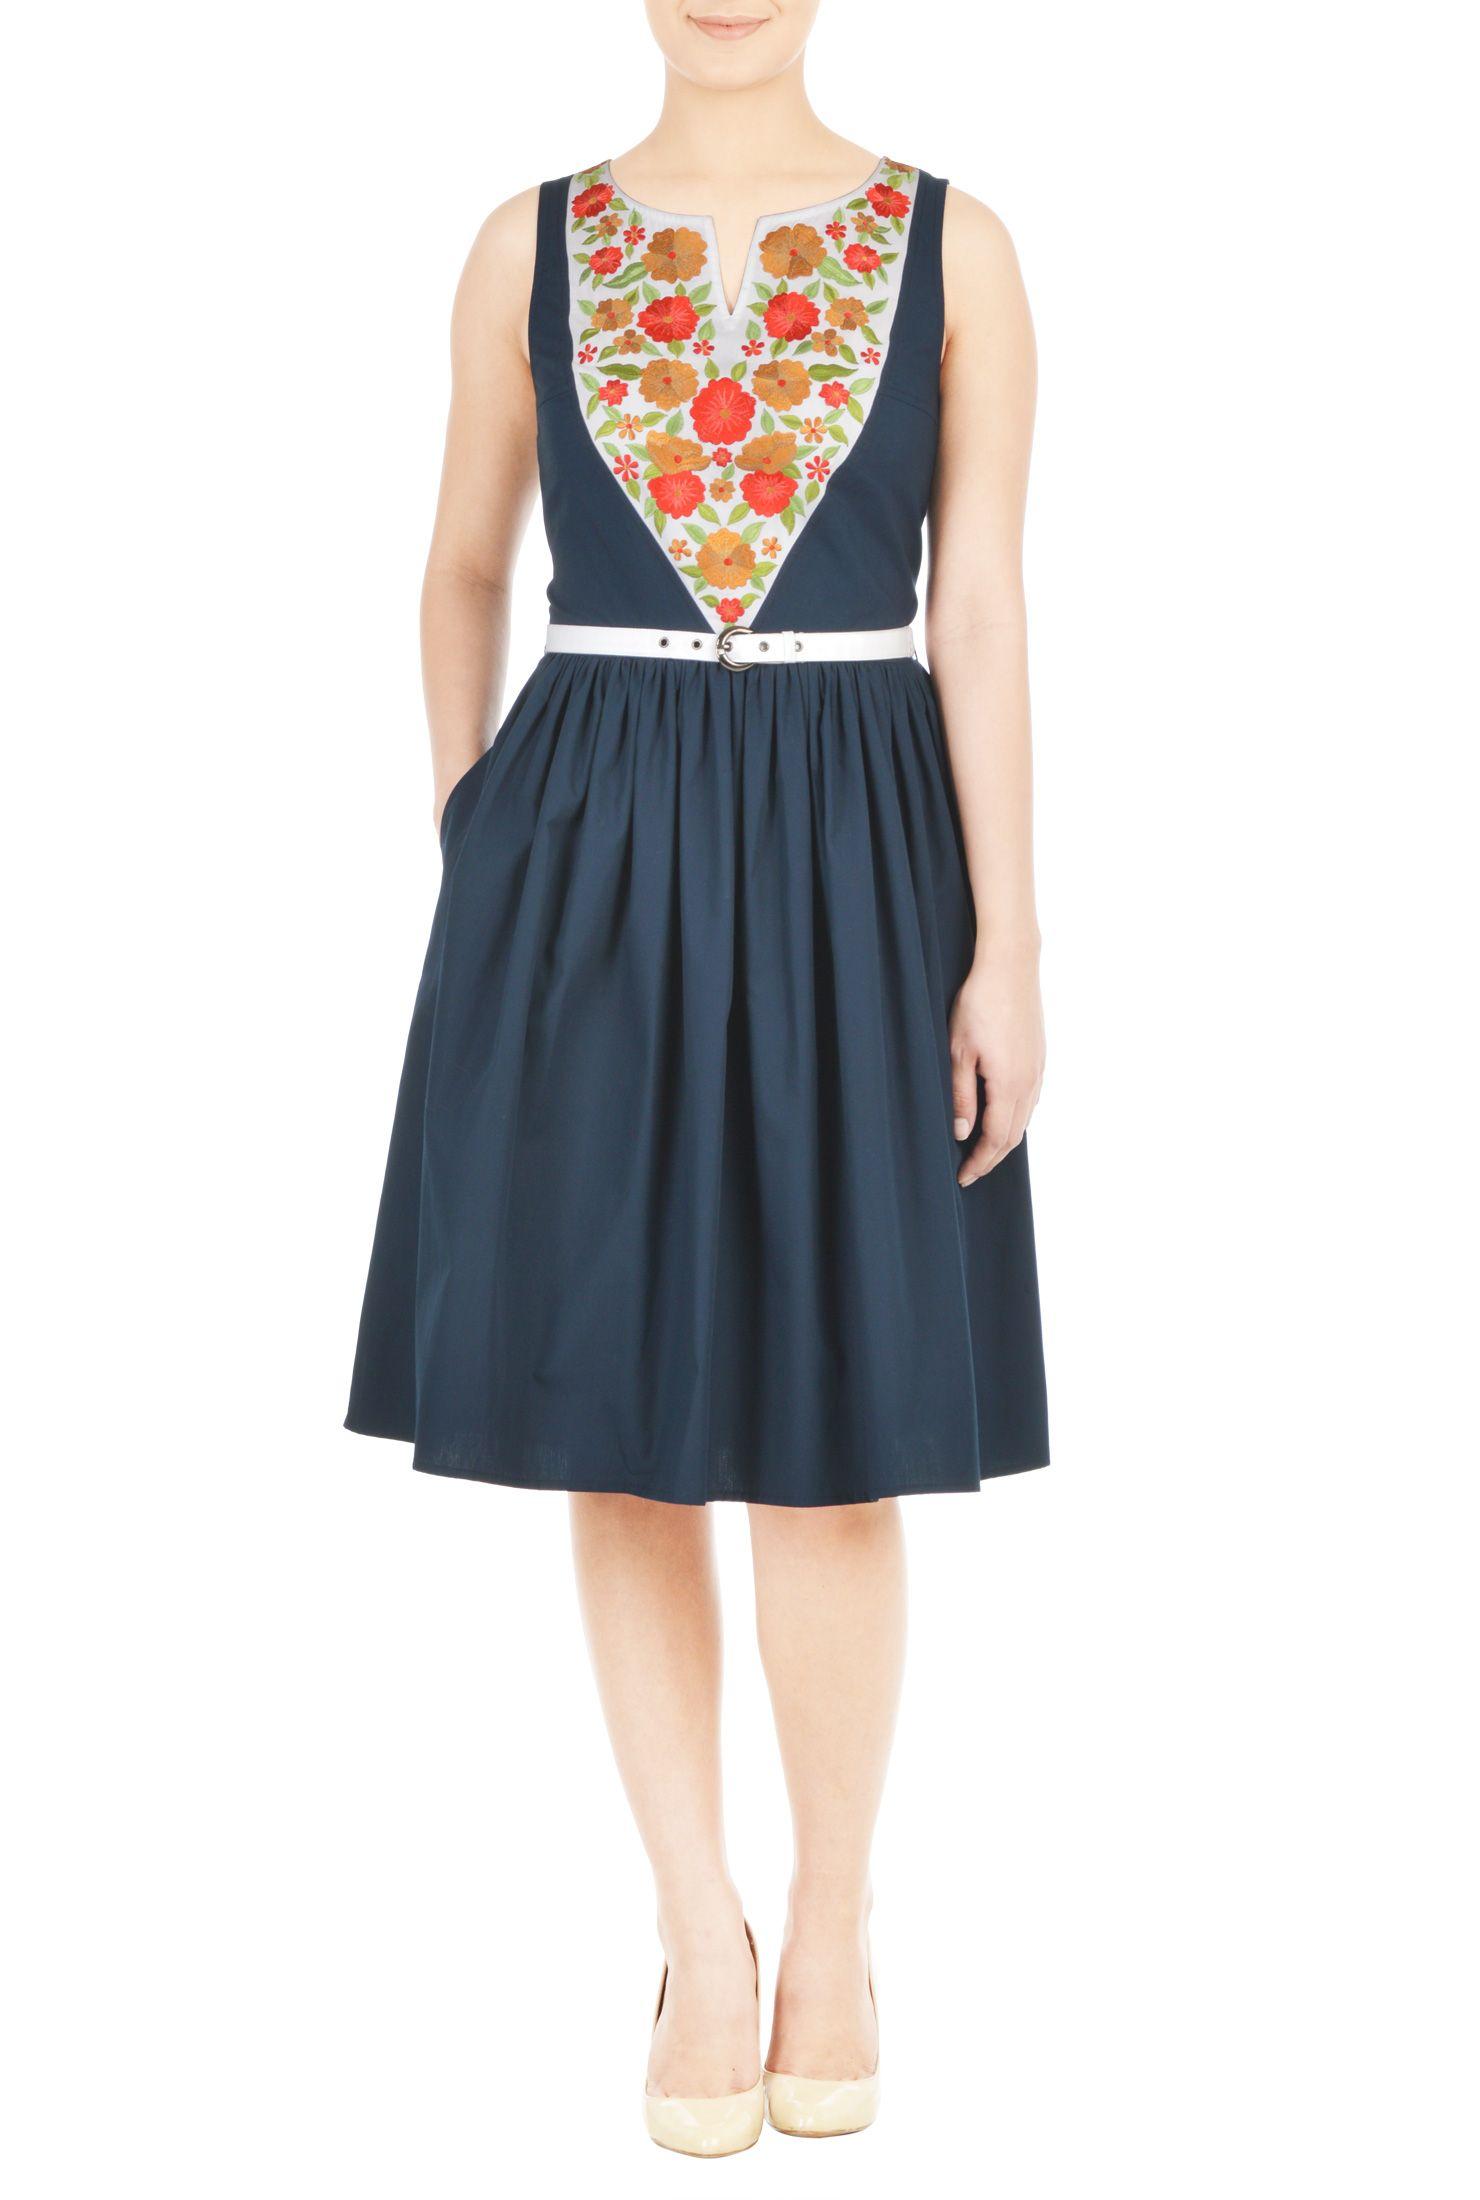 Aline dresses below knee length dresses boat neck dresses casual